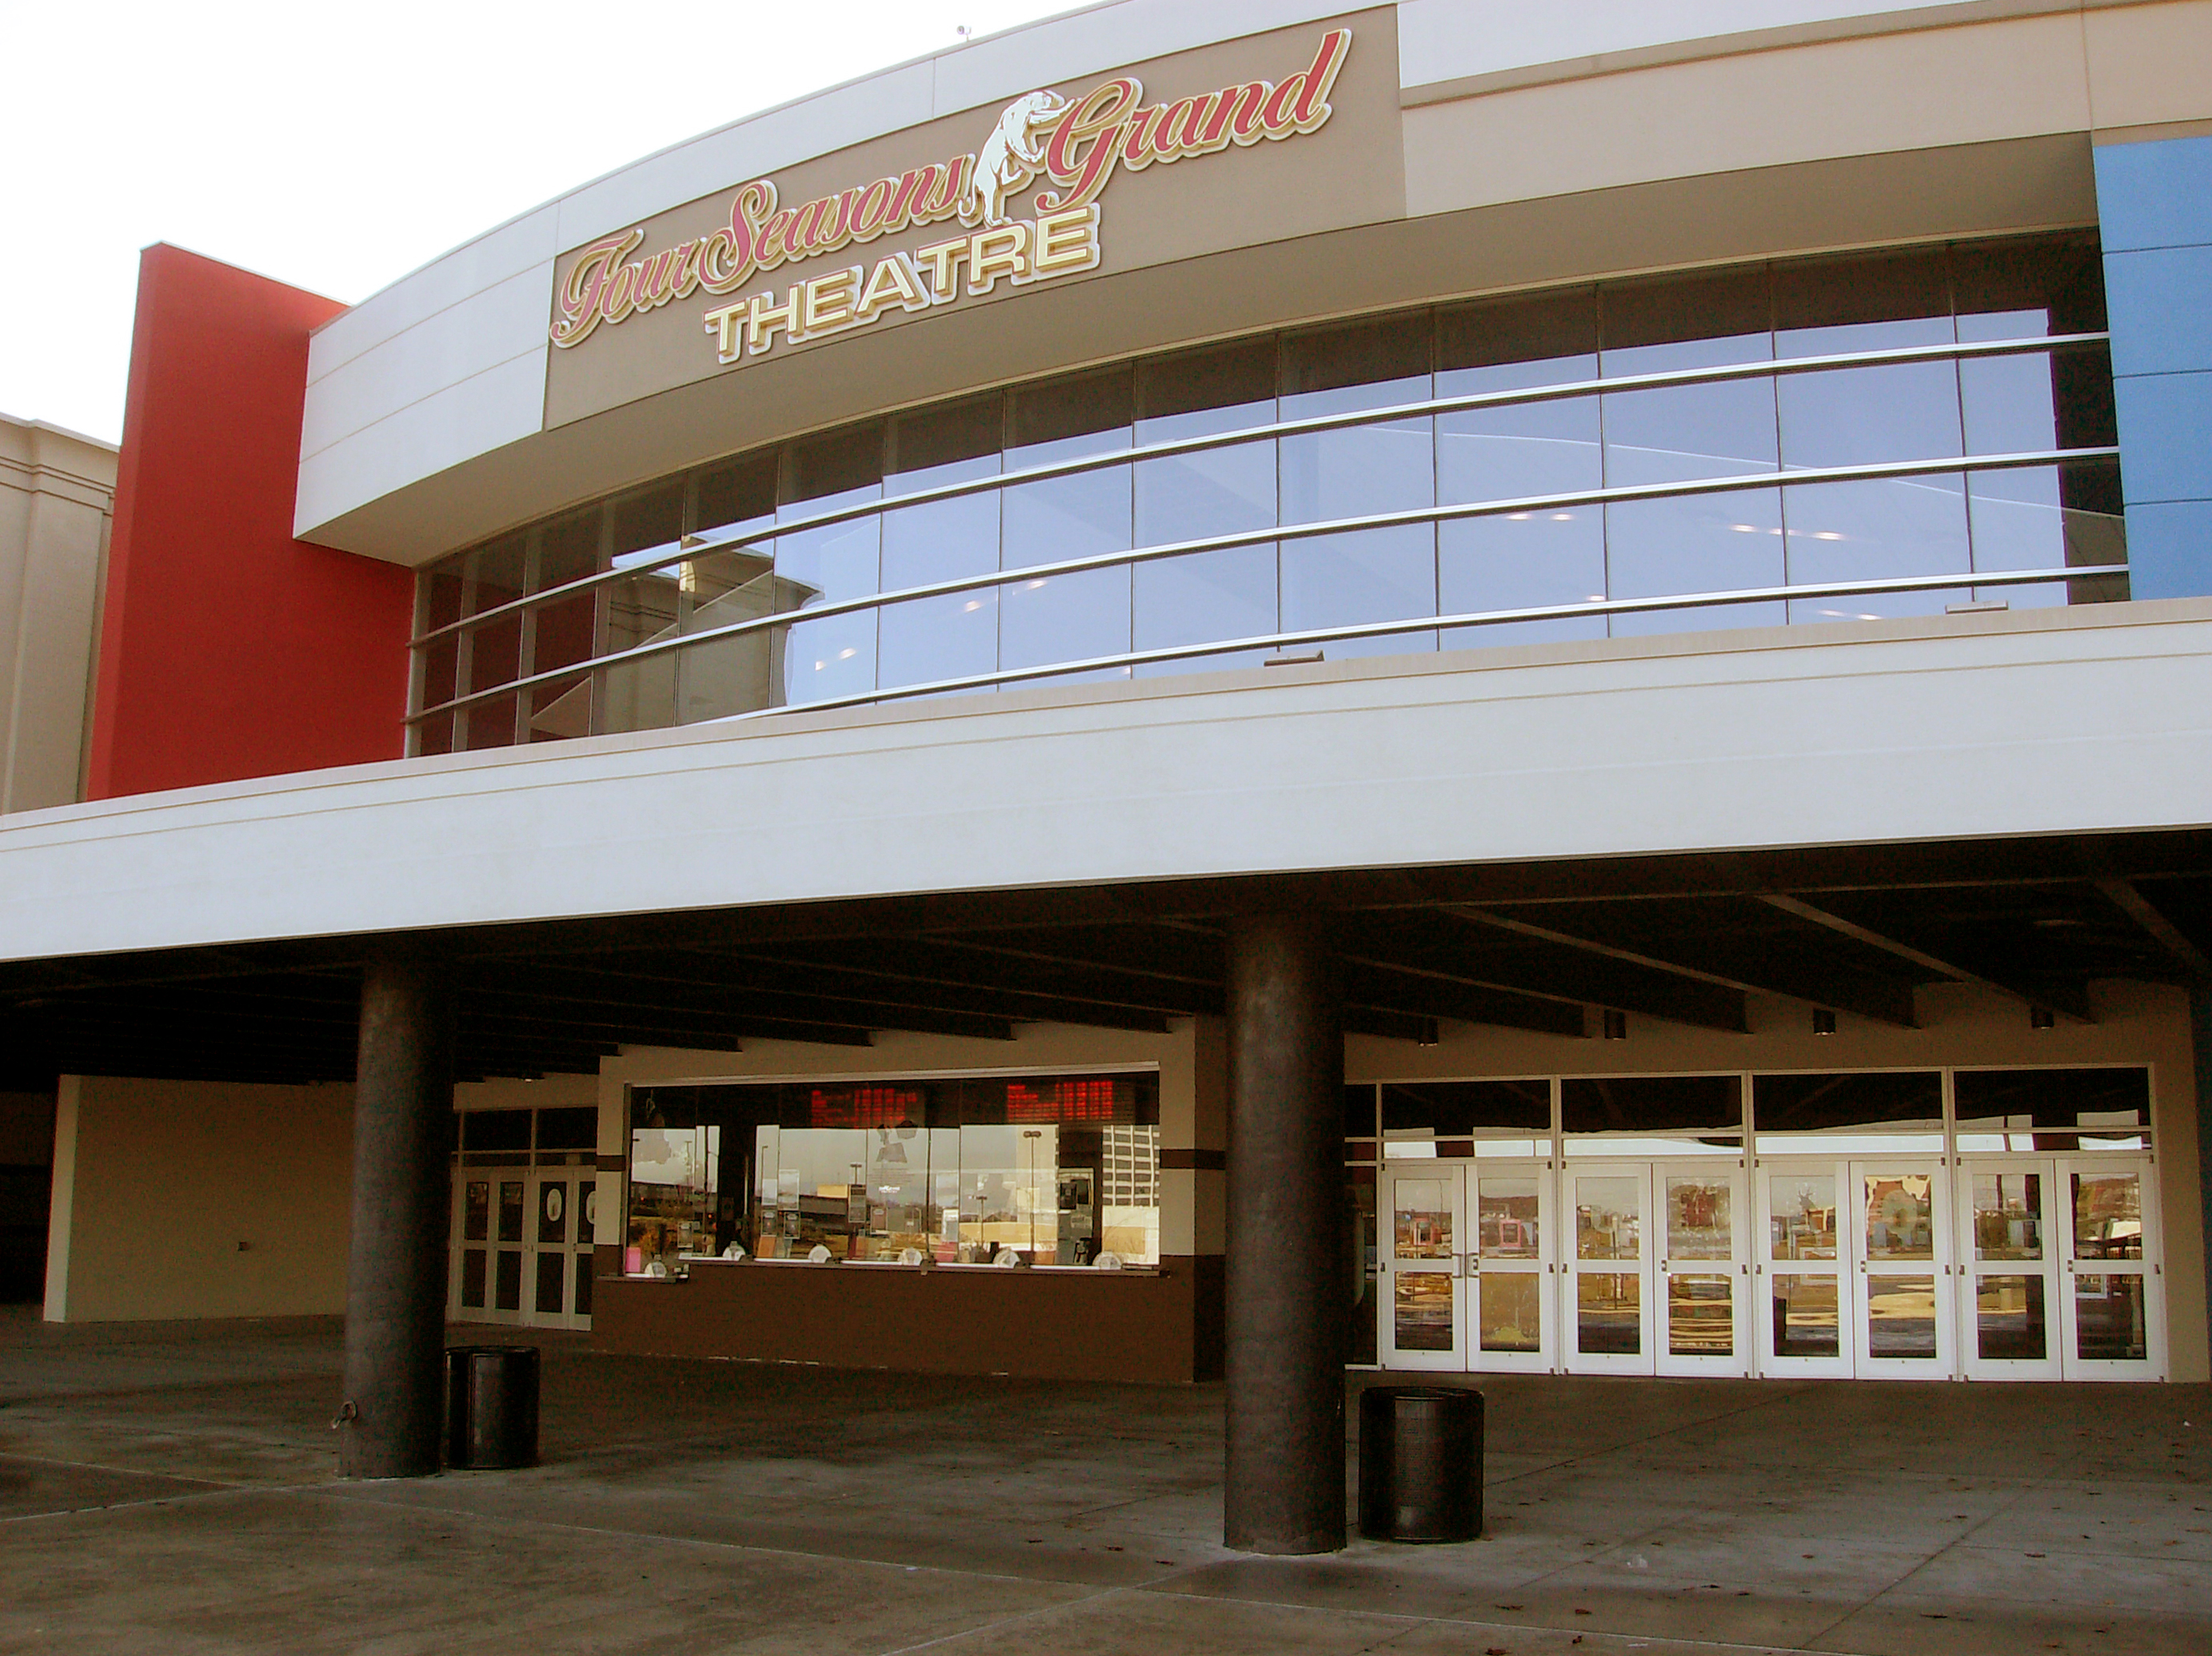 the grand theatre movie tavern four seasons station 2700